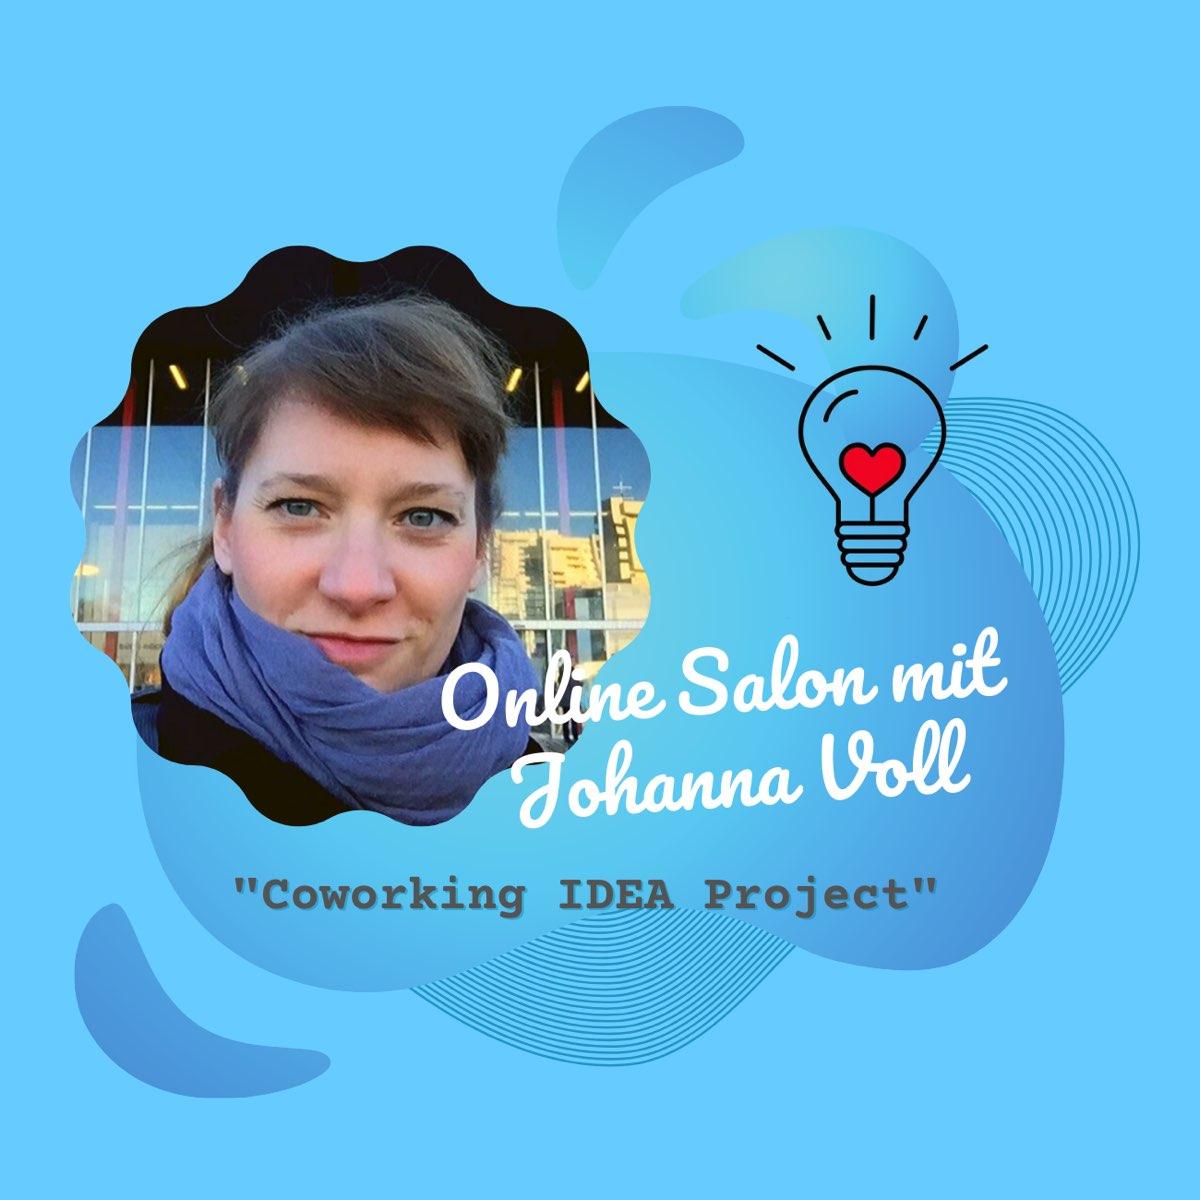 Johanna Voll Coworking IDEA Project